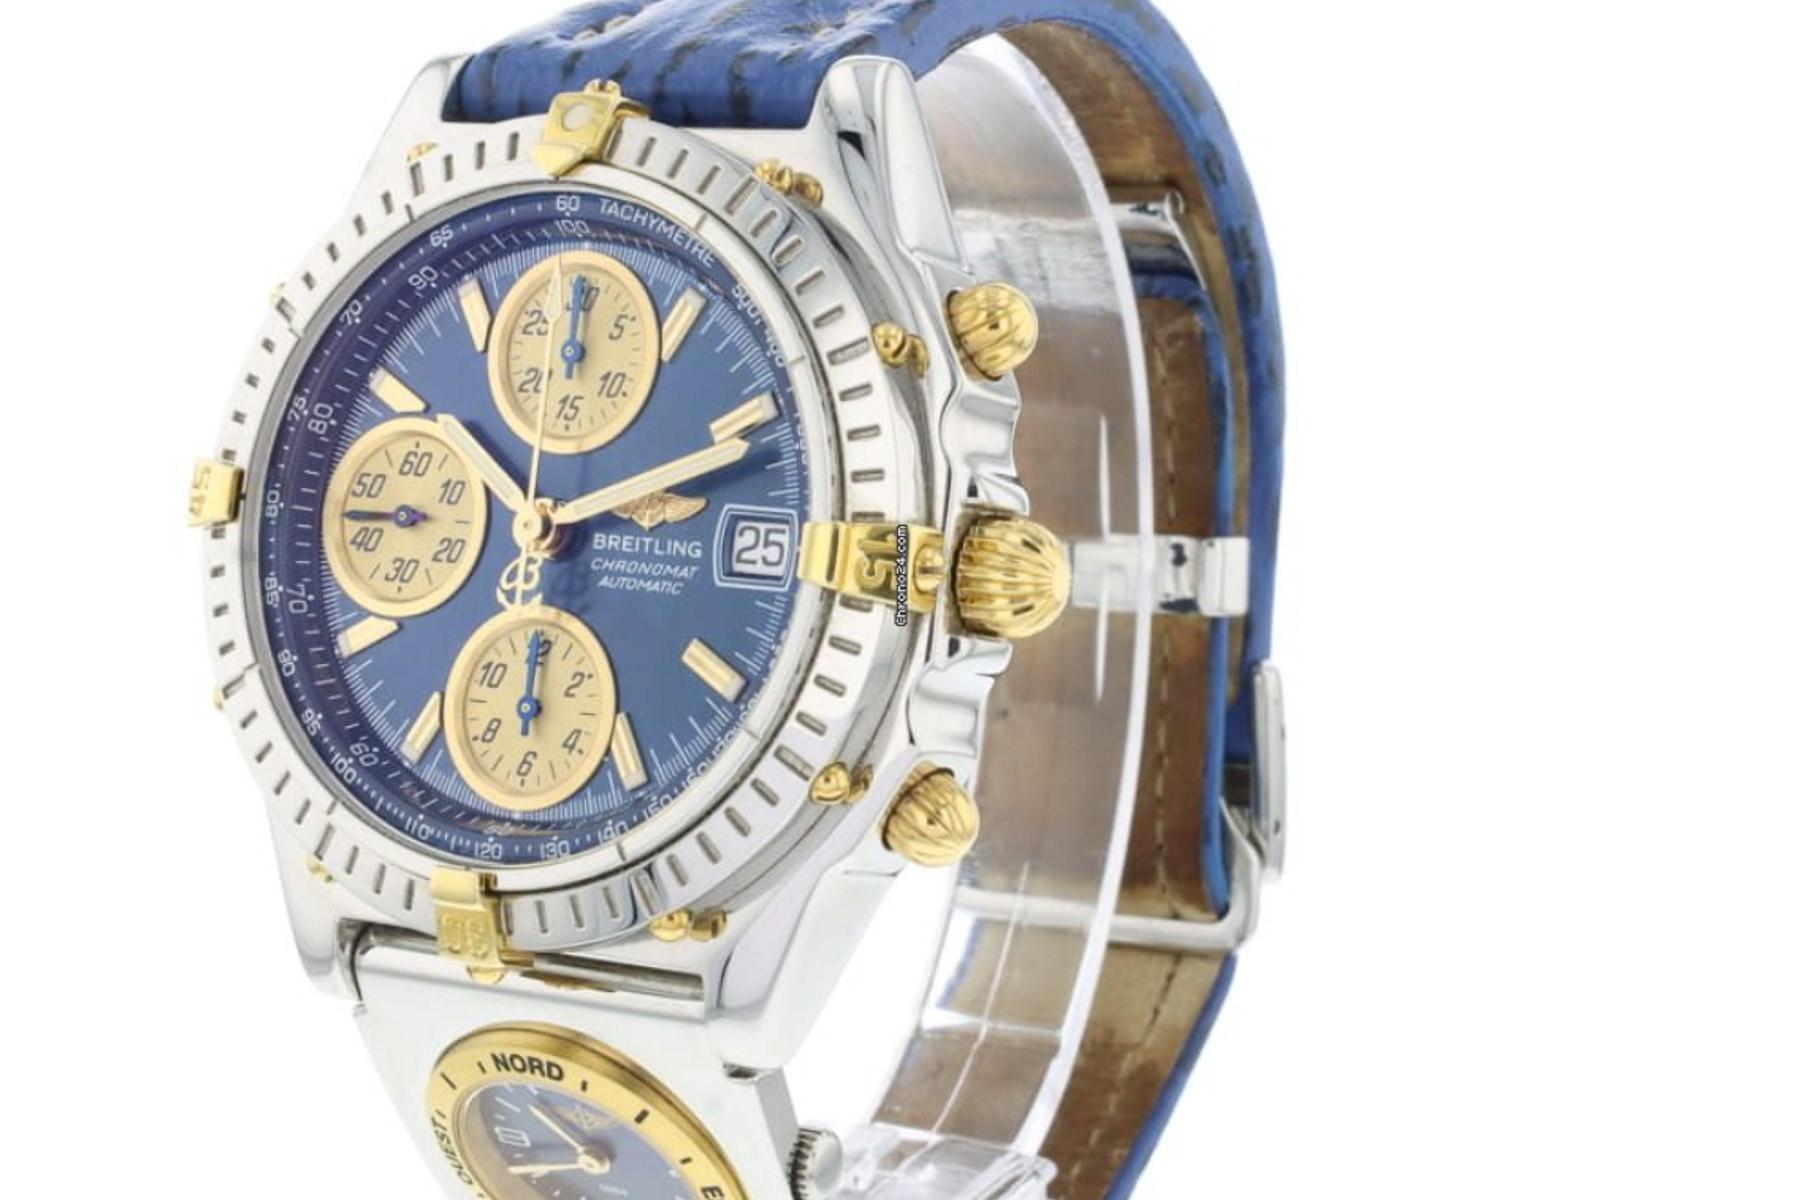 Wrist Game or Crying Shame: Breitling Chronomat UTC